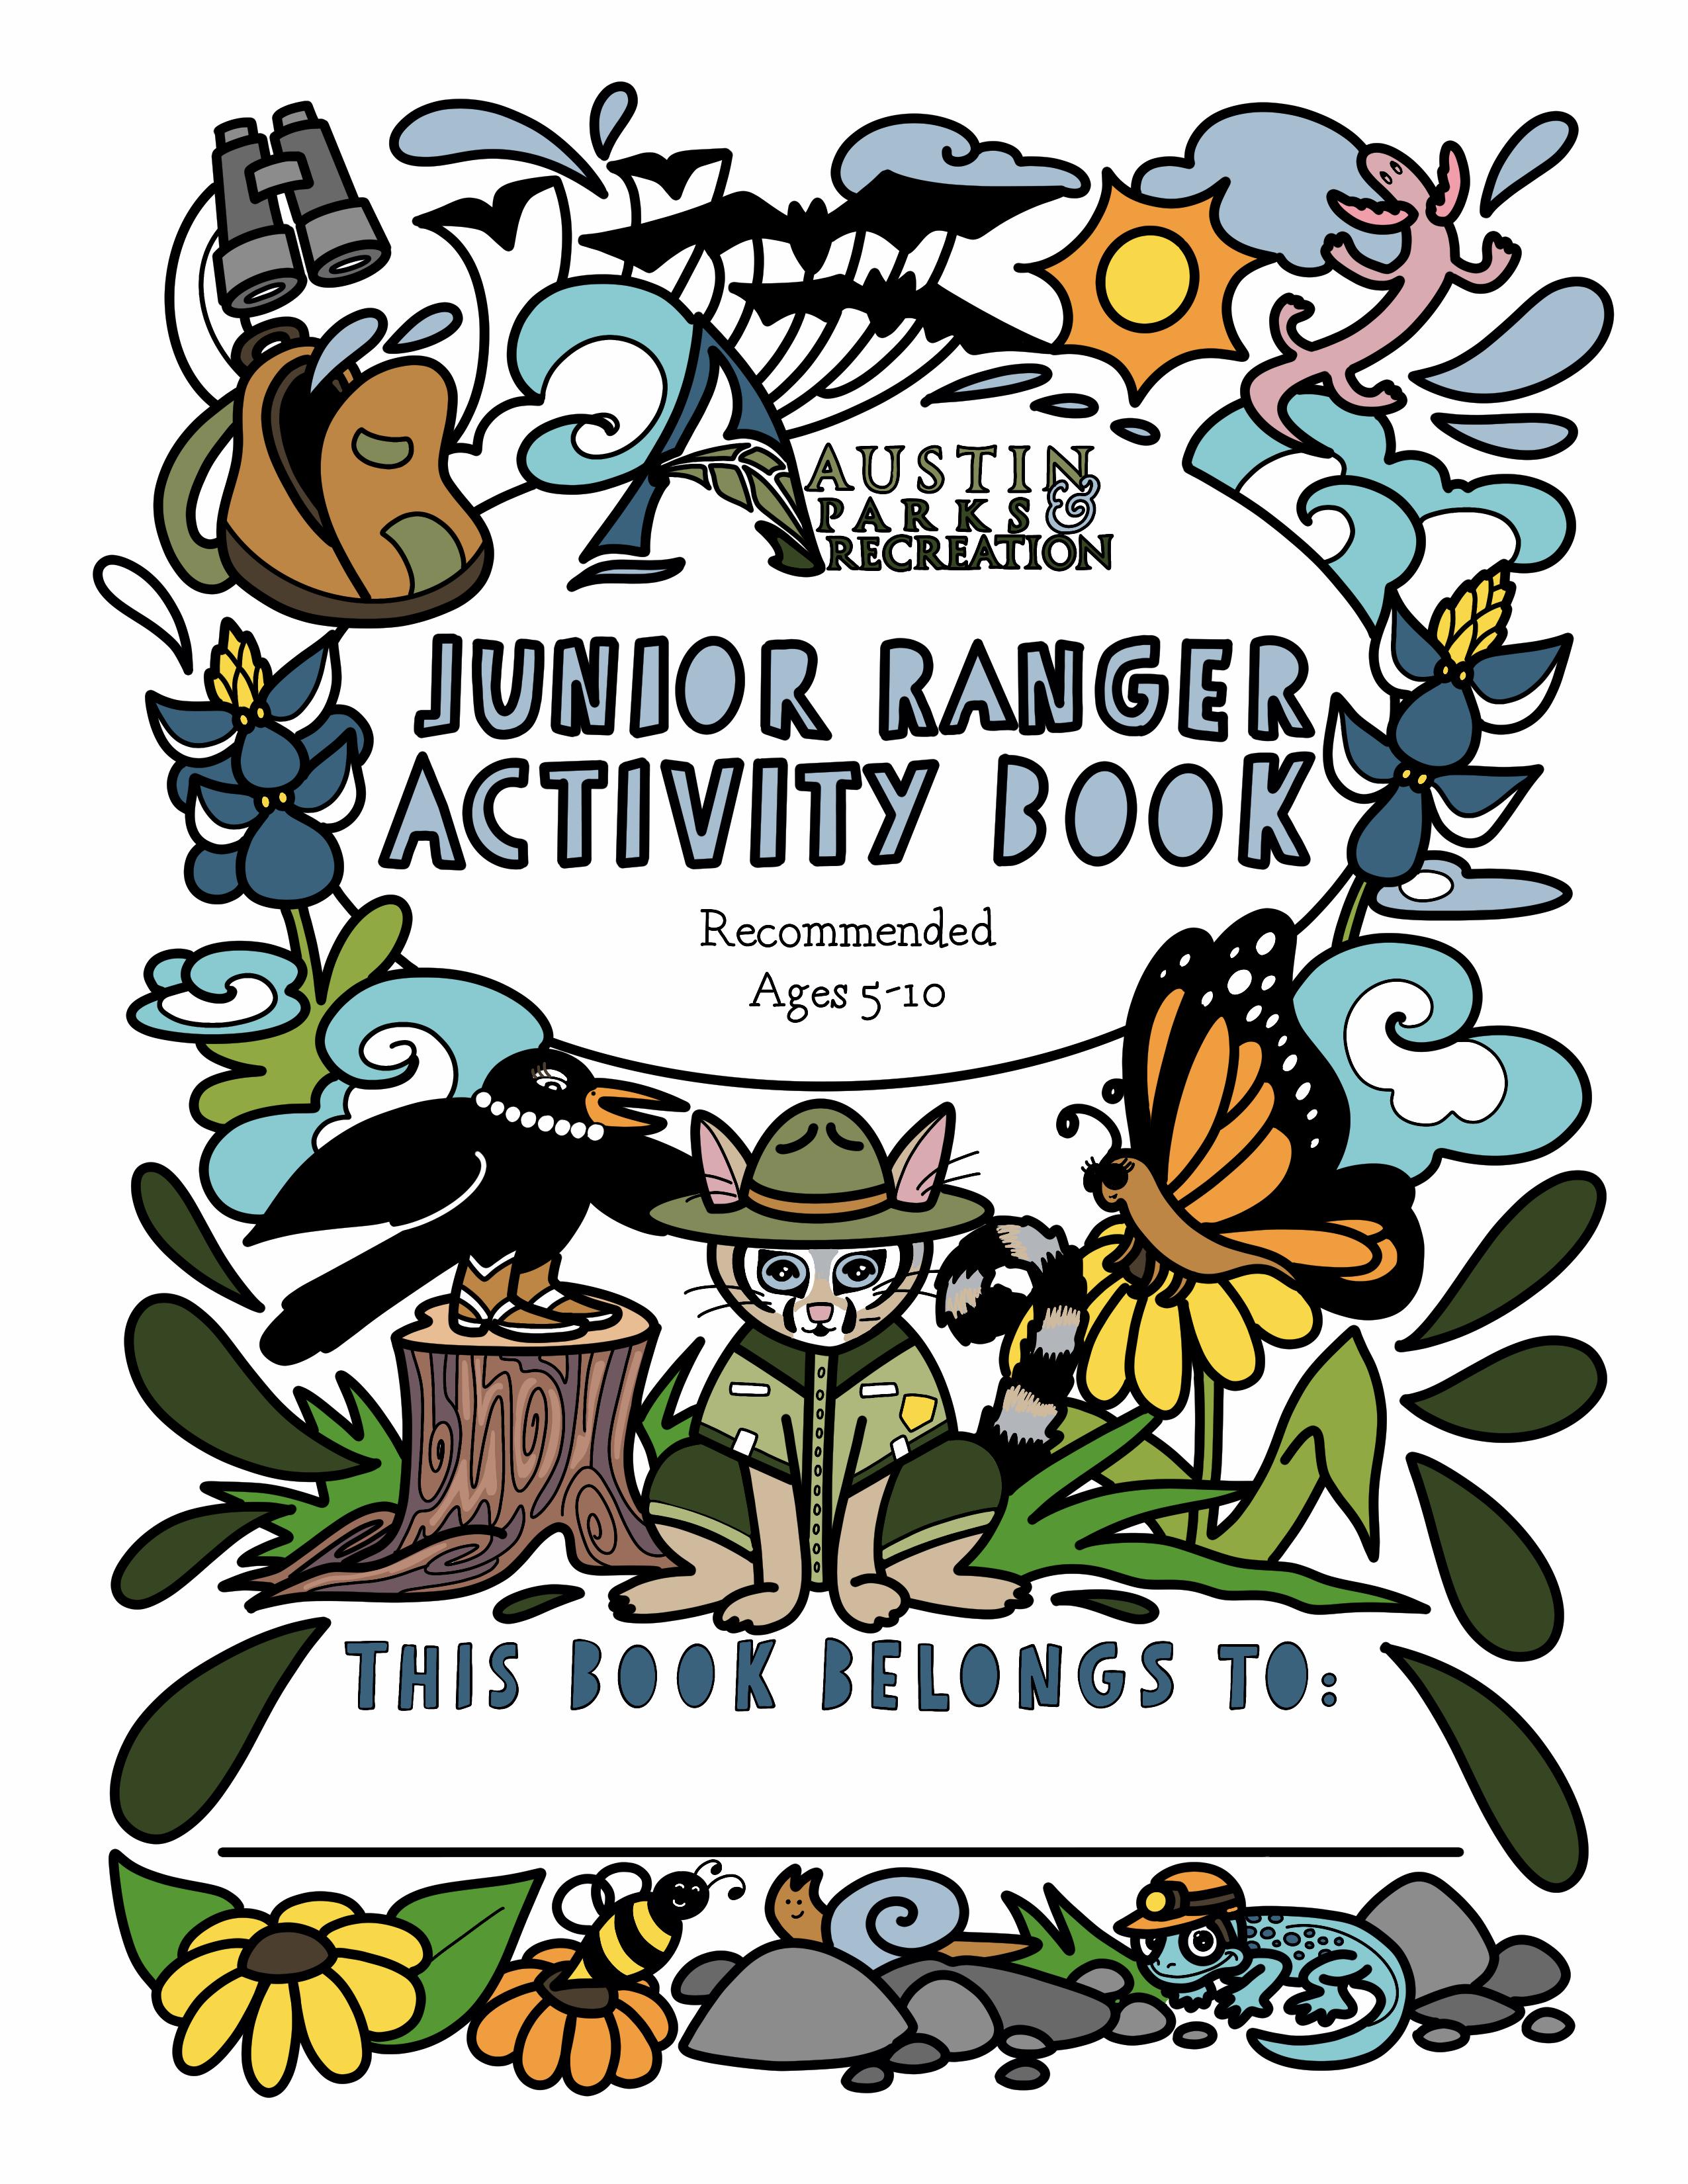 Junior Ranger Activity Book